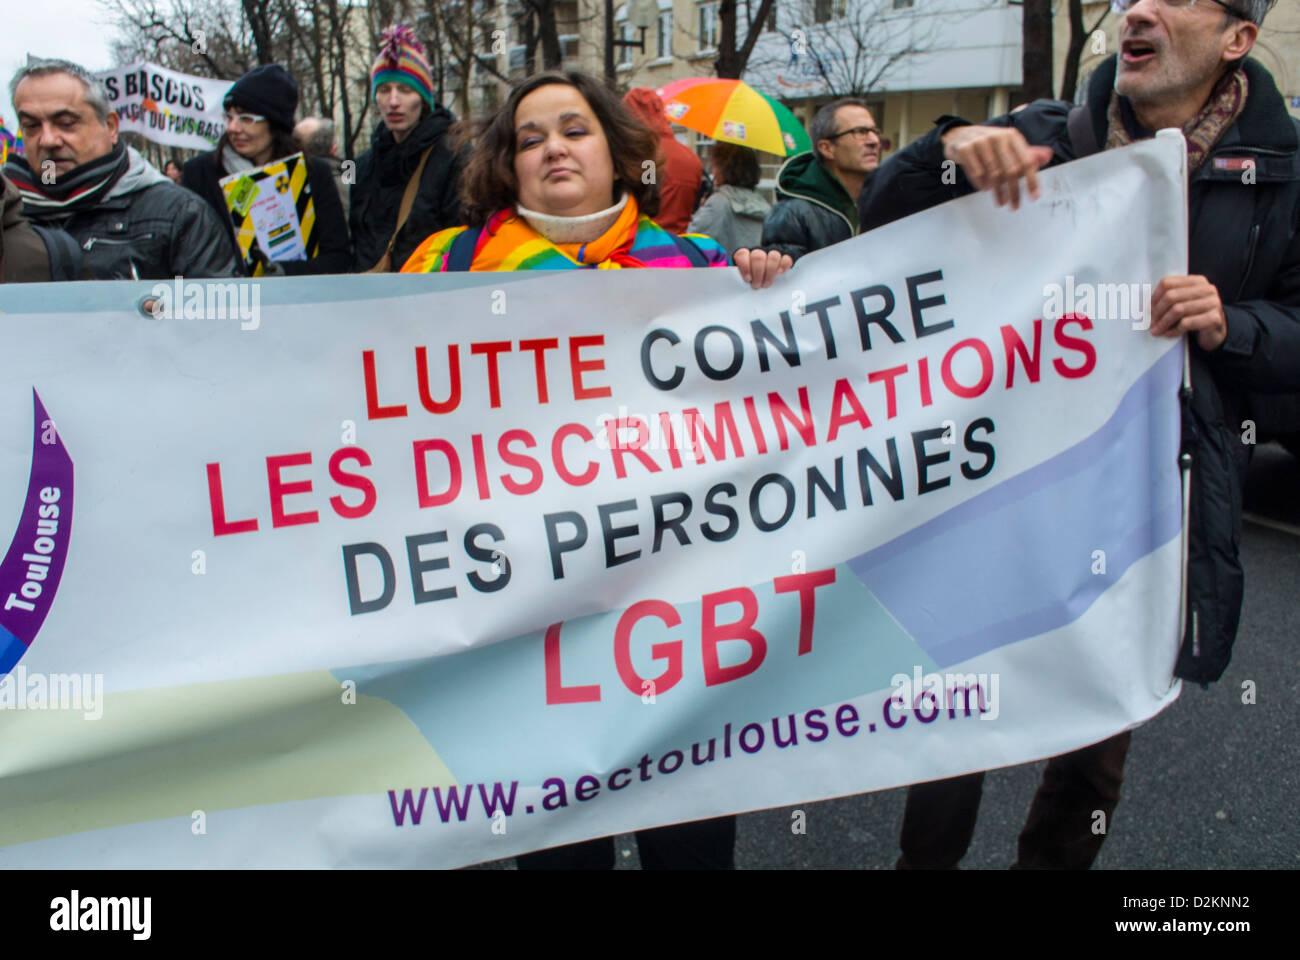 Homosexuelle Strafverfolgung datiert